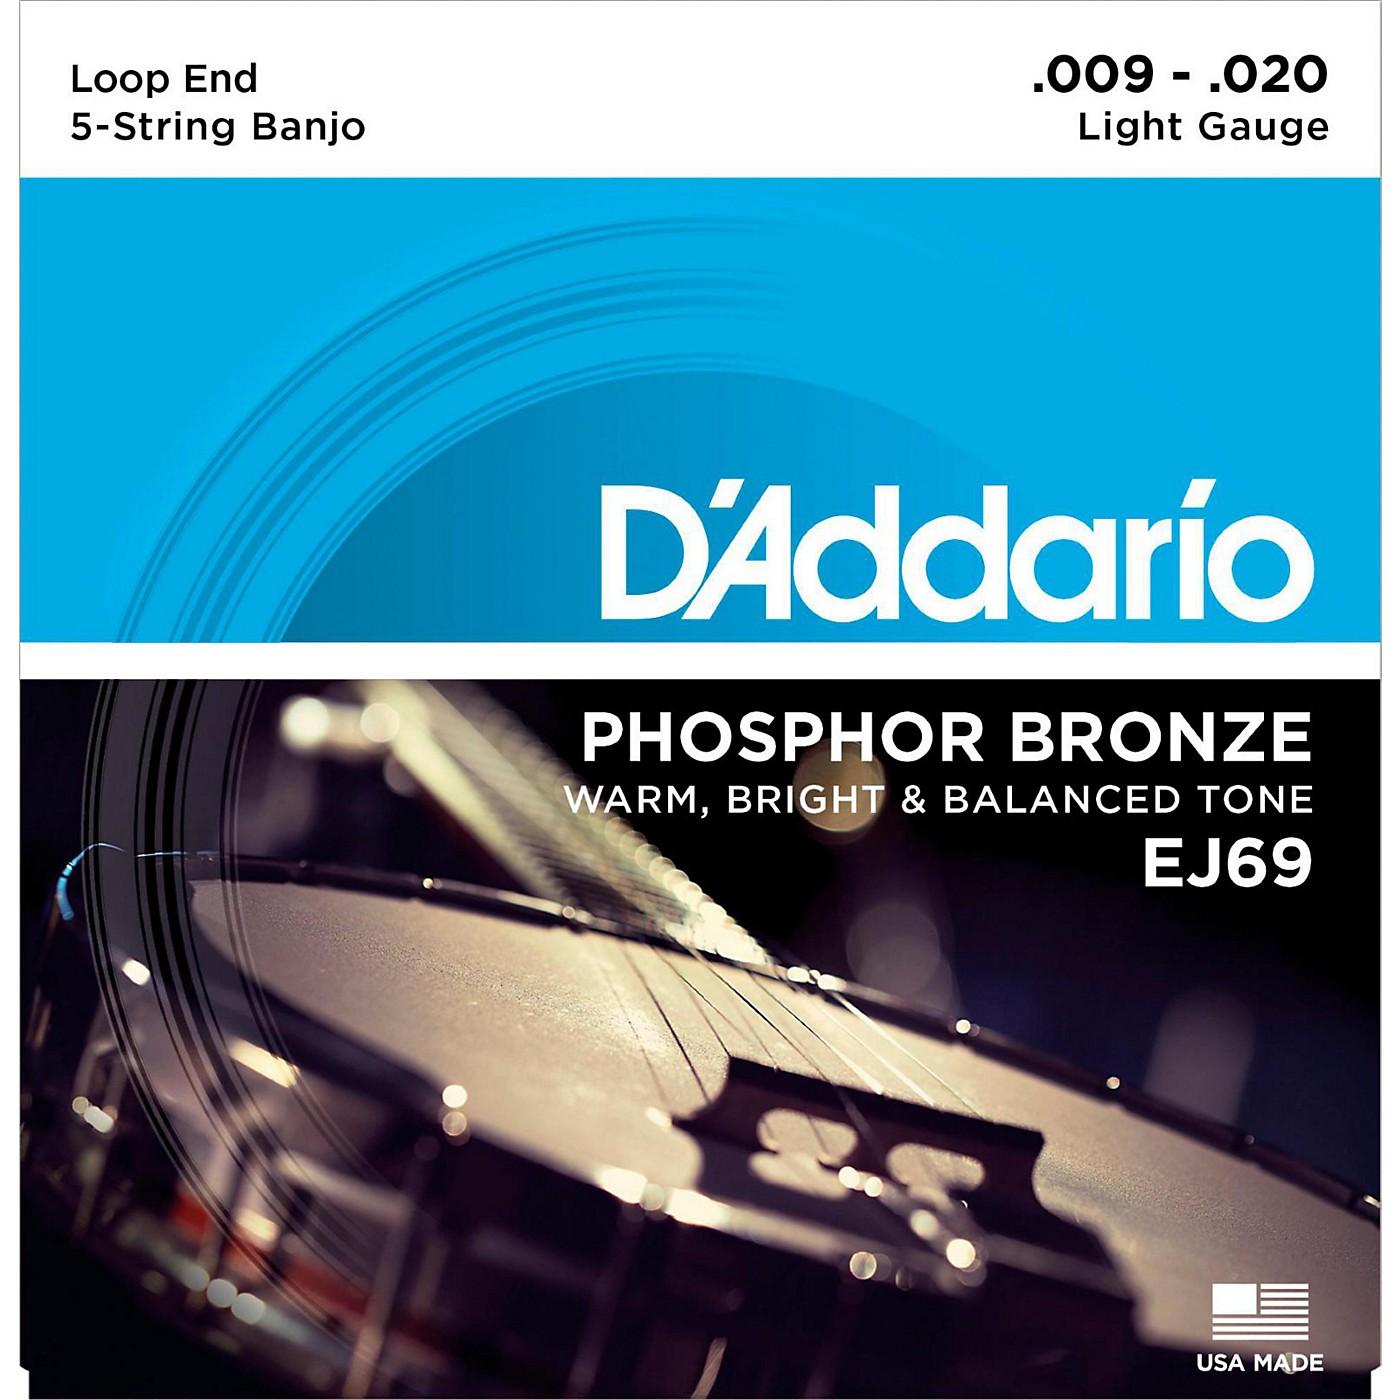 D'Addario EJ69 Phosphor Bronze Light 5-String Banjo Strings (9-20) thumbnail